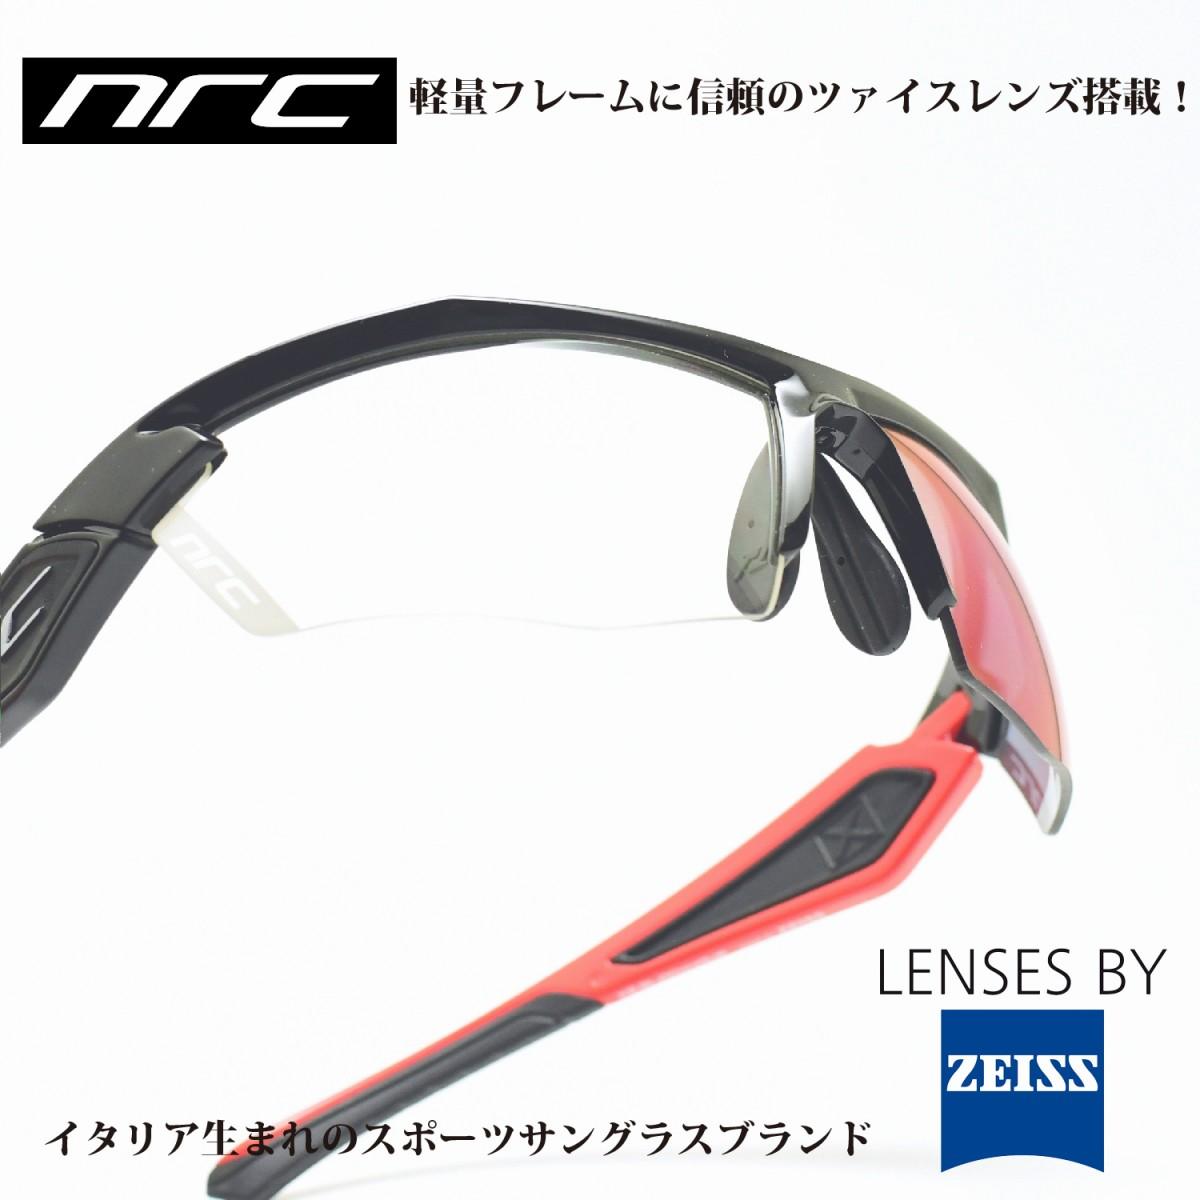 nrc エヌアールシー X5BLOCKHAUS/GRAY RED MIRRORメガネ 眼鏡 めがね メンズ レディース おしゃれ ブランド人気 おすすめ フレーム 流行り 度付き レンズ サングラス